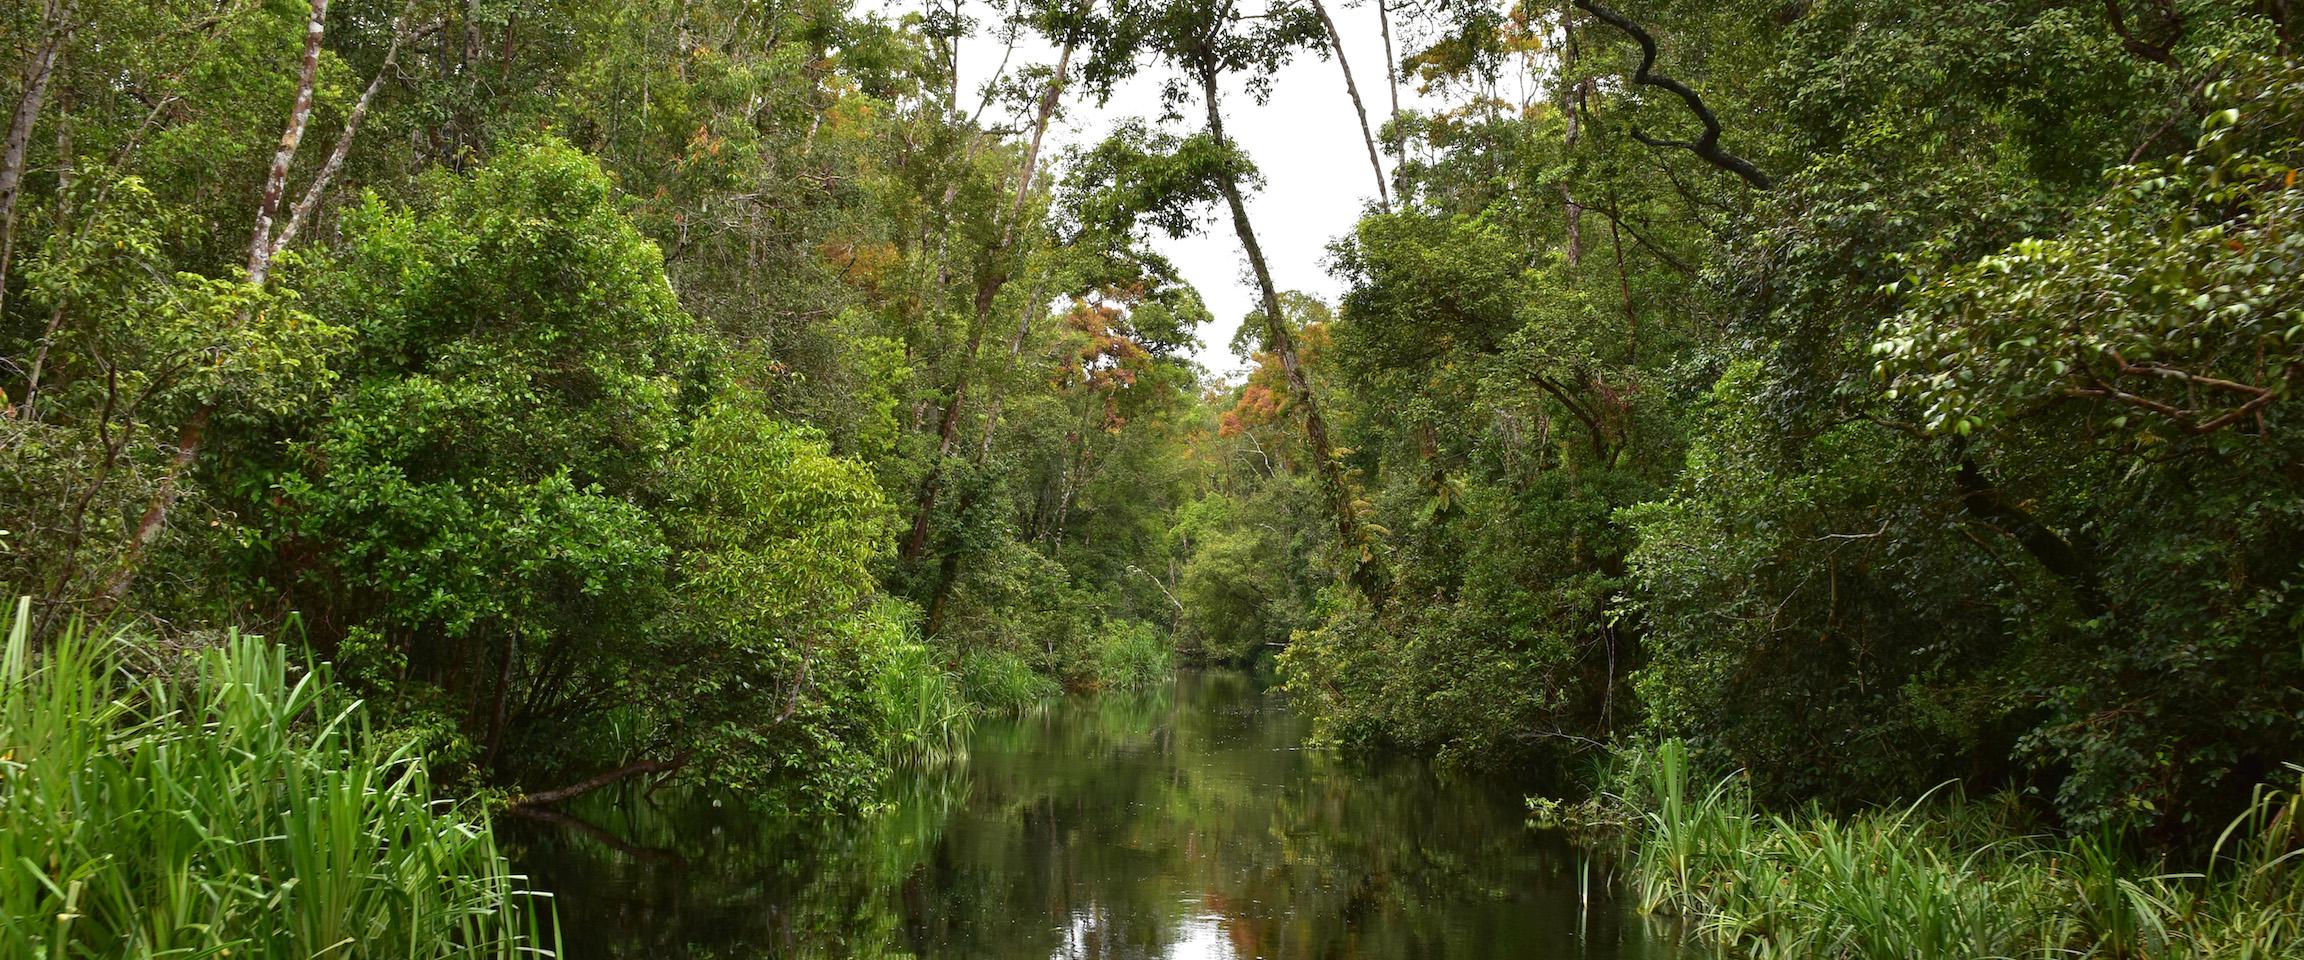 Tanjung Puting Rainforest